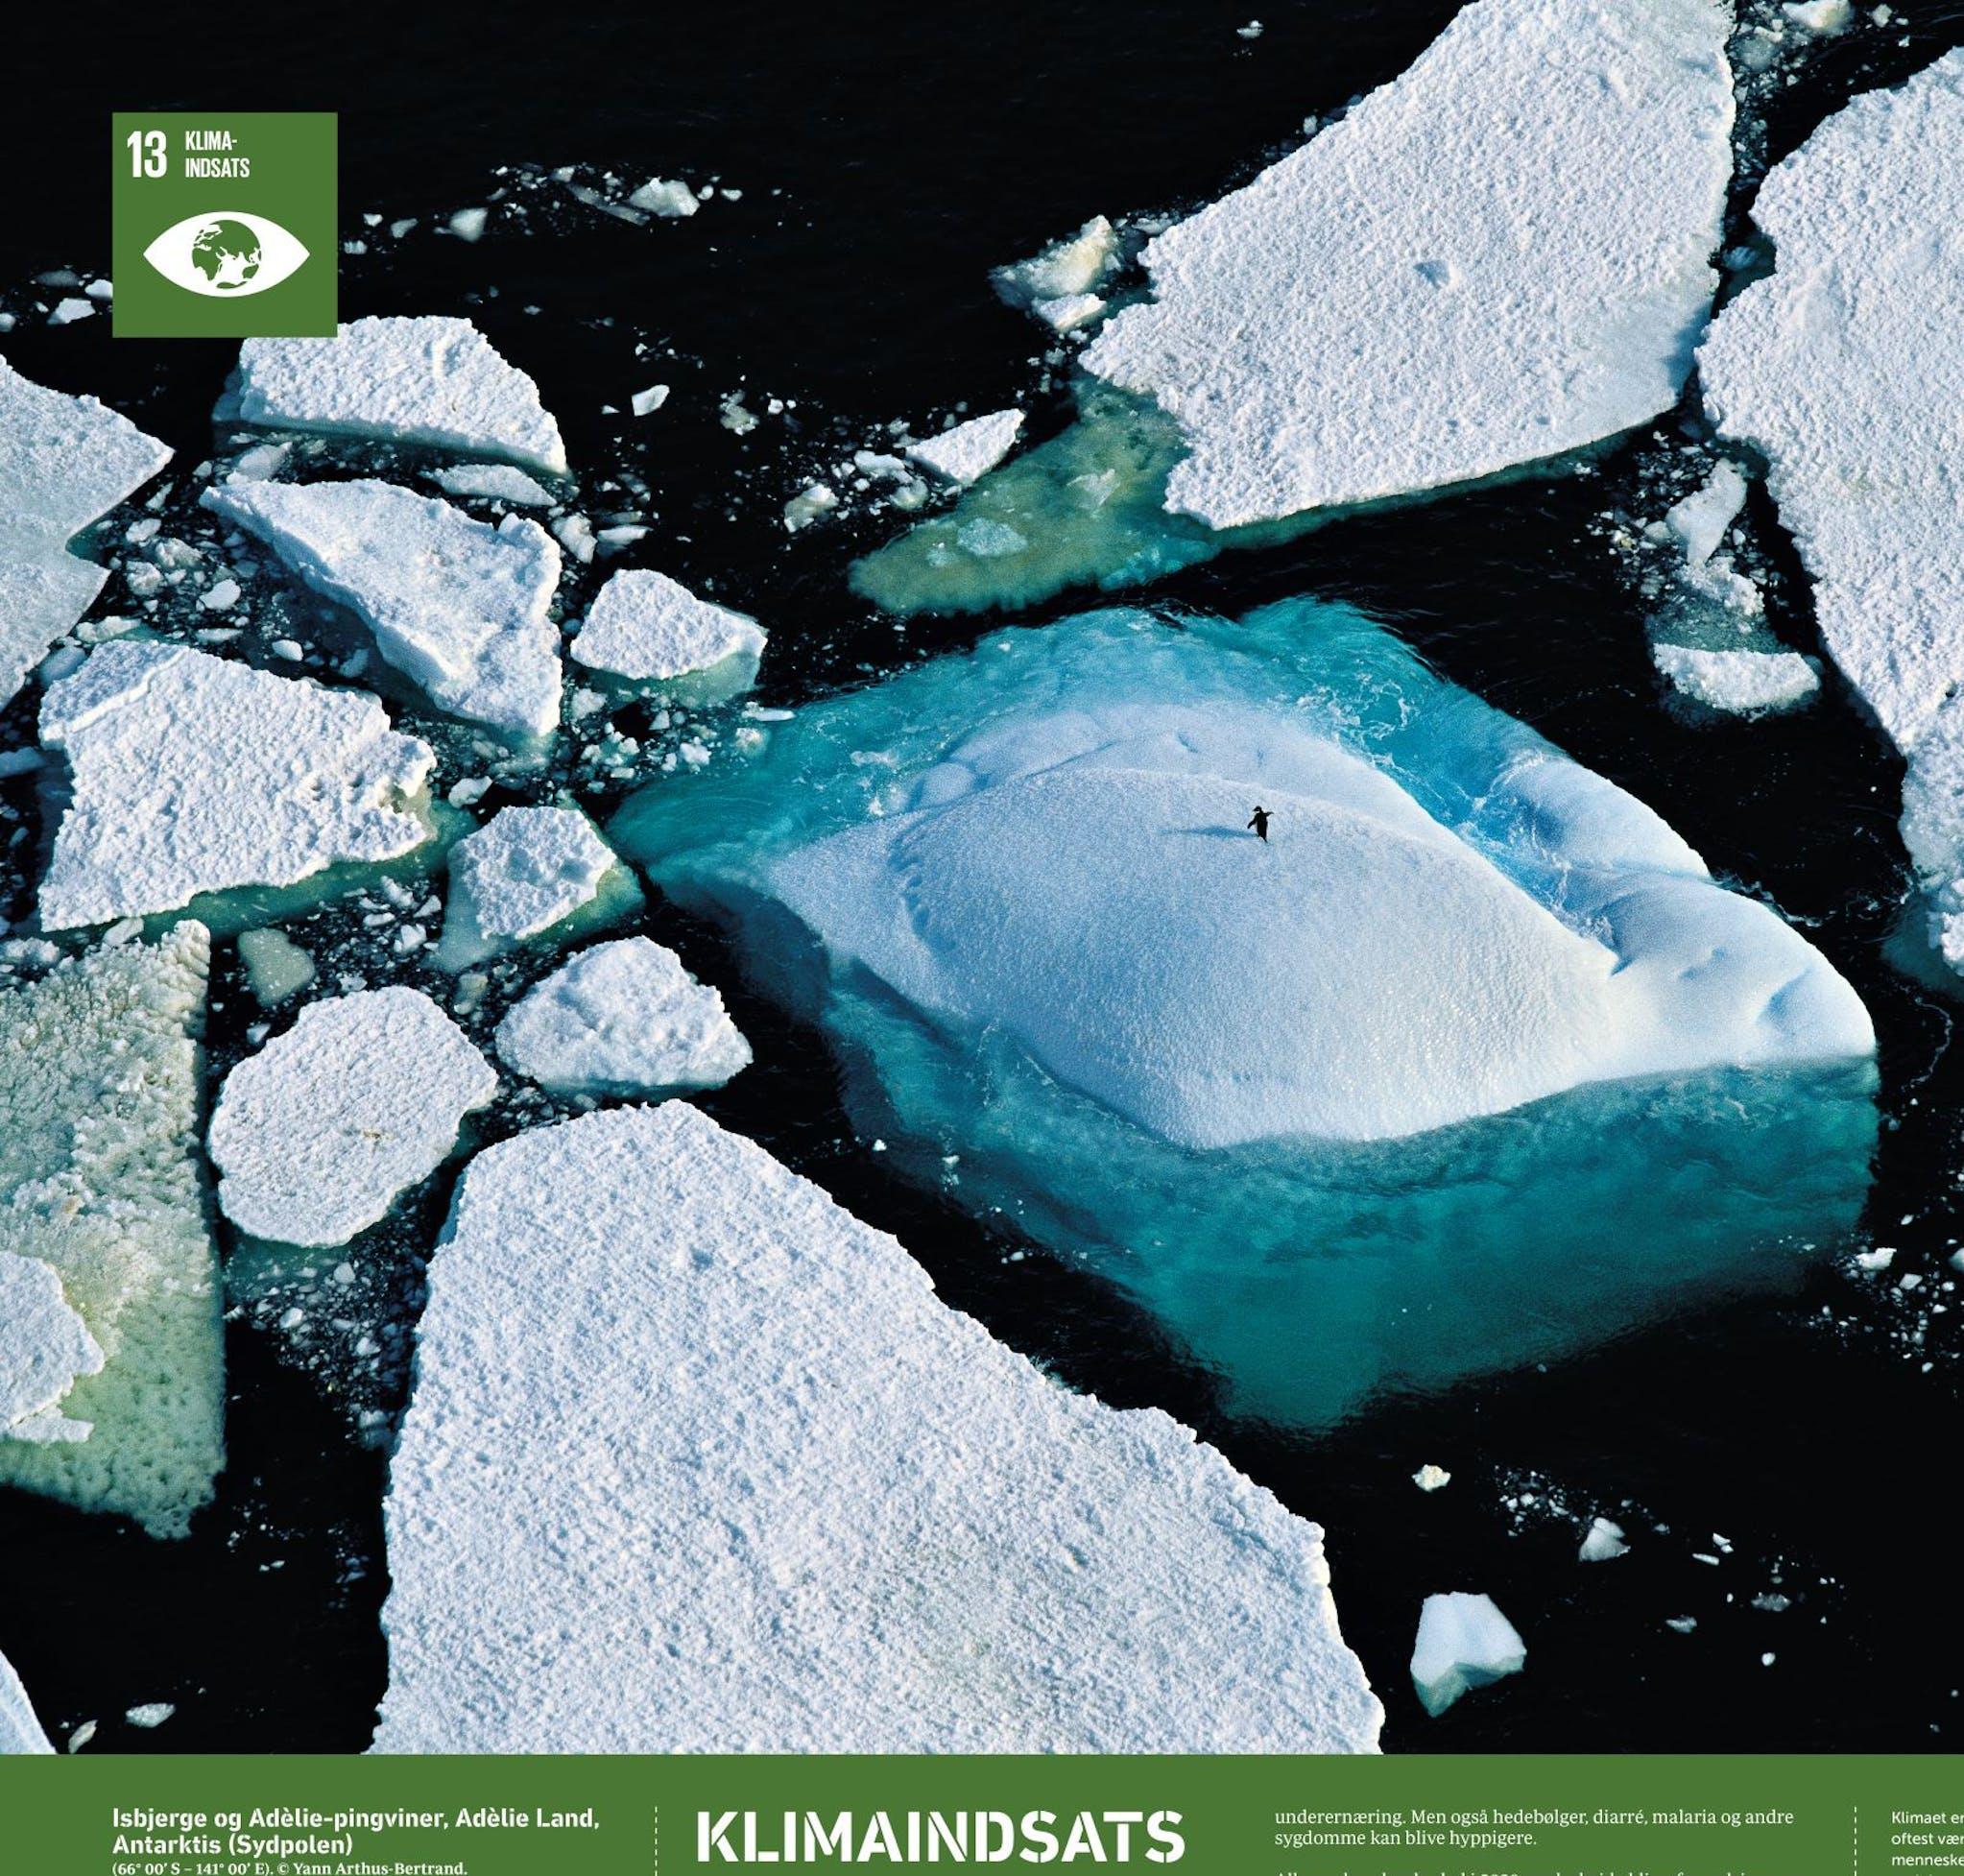 Verdensmål 13: Klimaindsats. Foto: Yann Arthus-Bertrand/2030 NOW